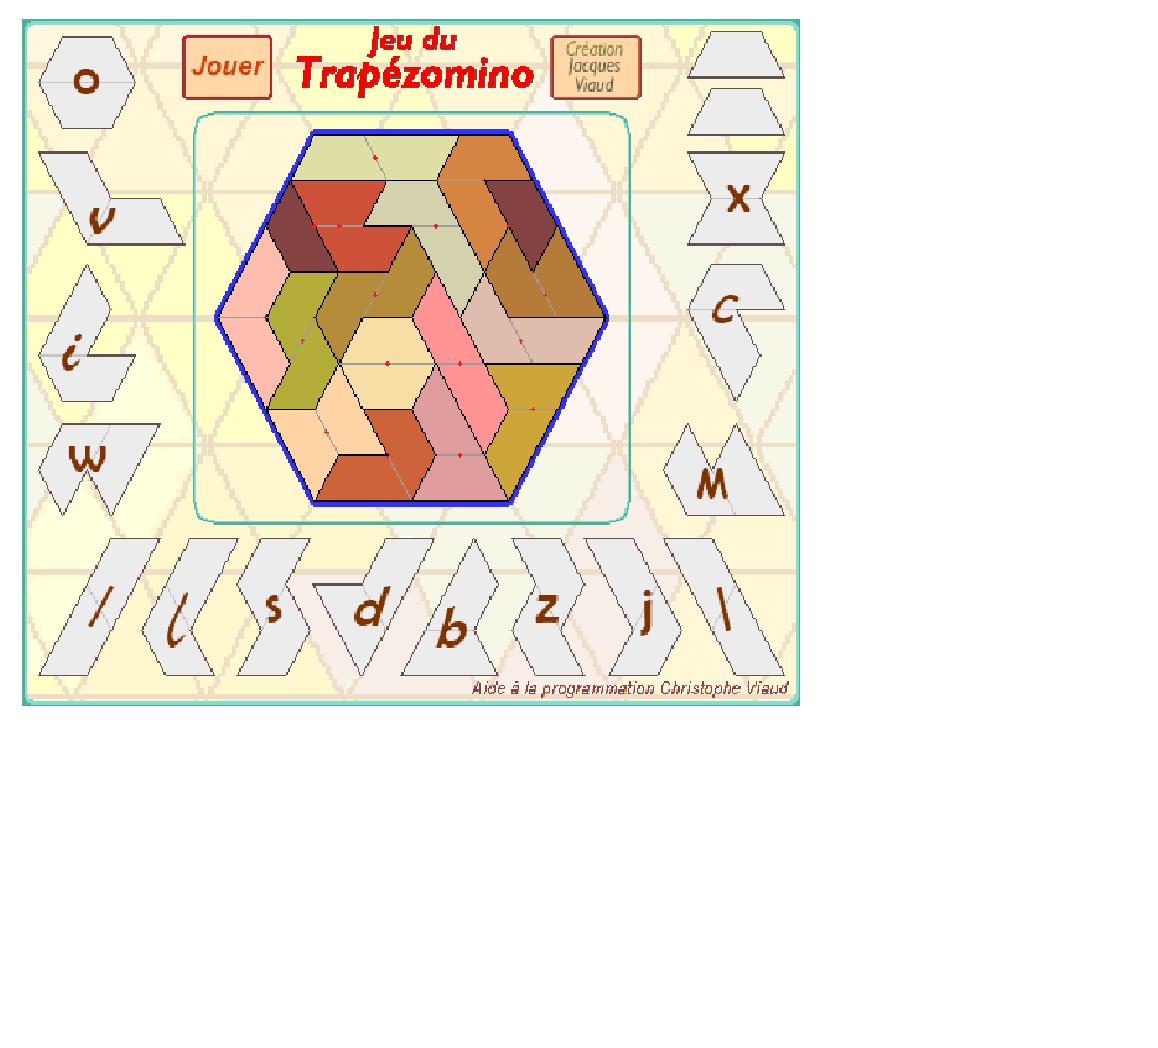 http://www.prise2tete.fr/upload/alorc63-TRAP2.png